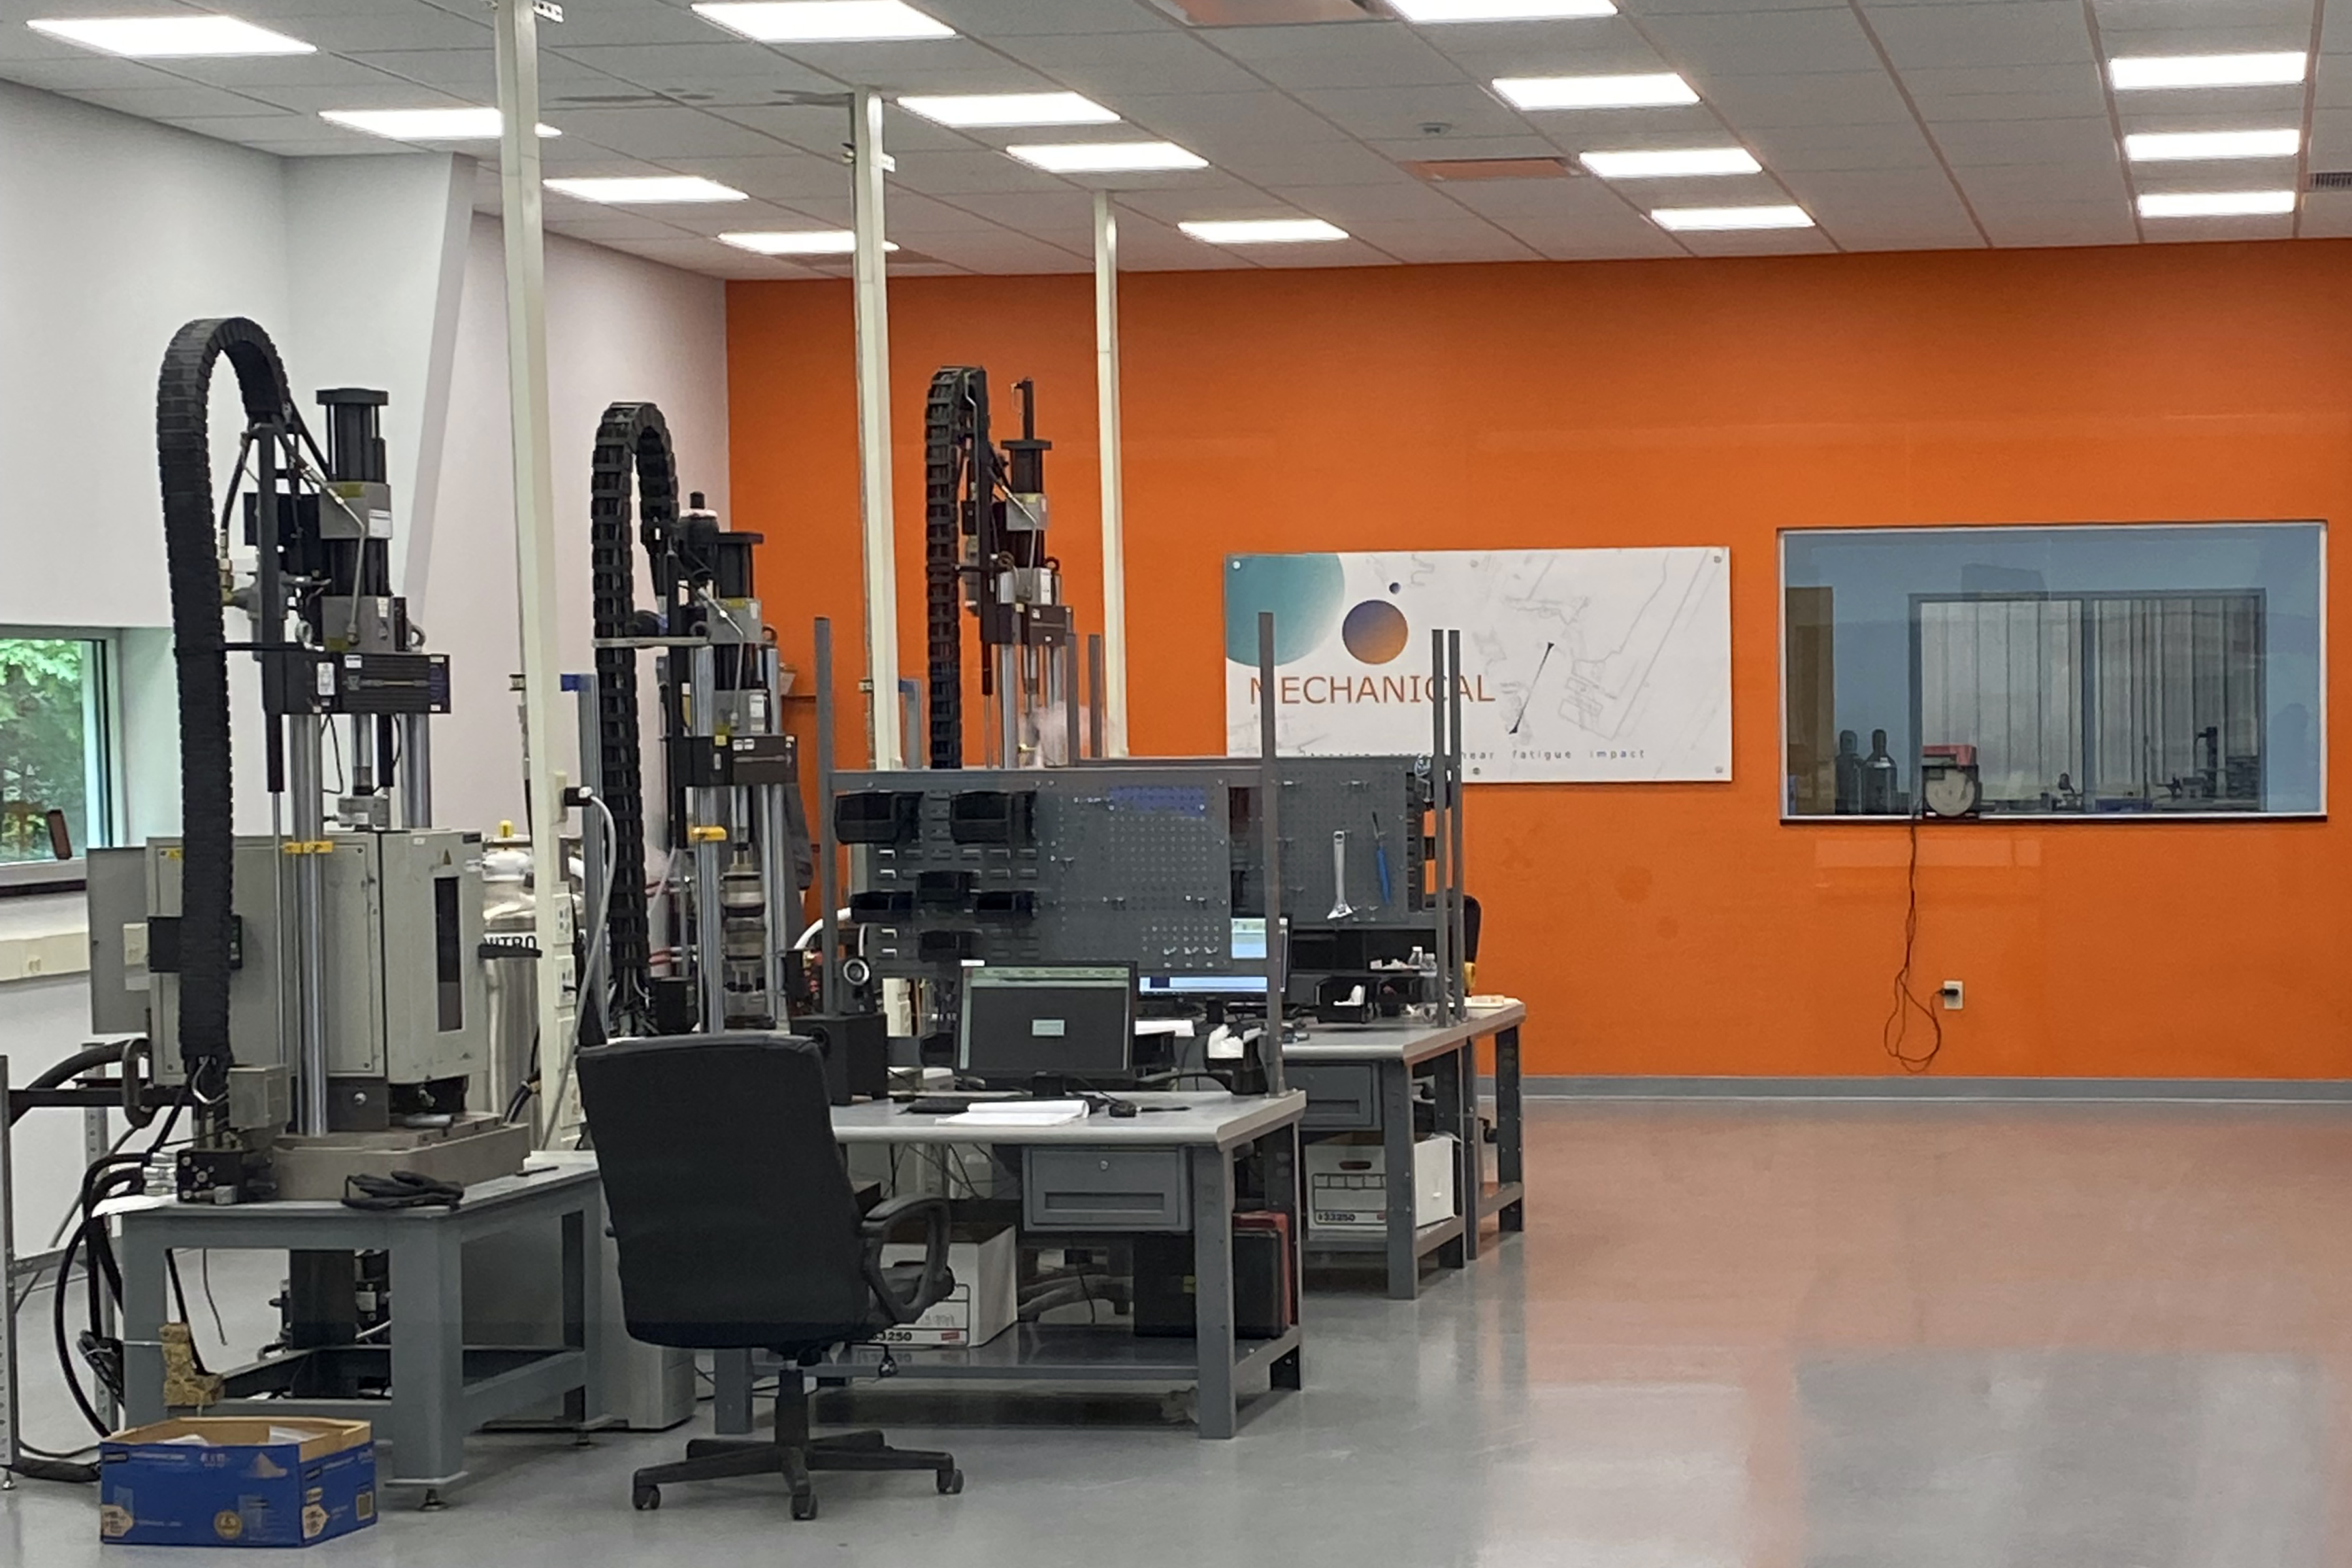 servomechanical lab